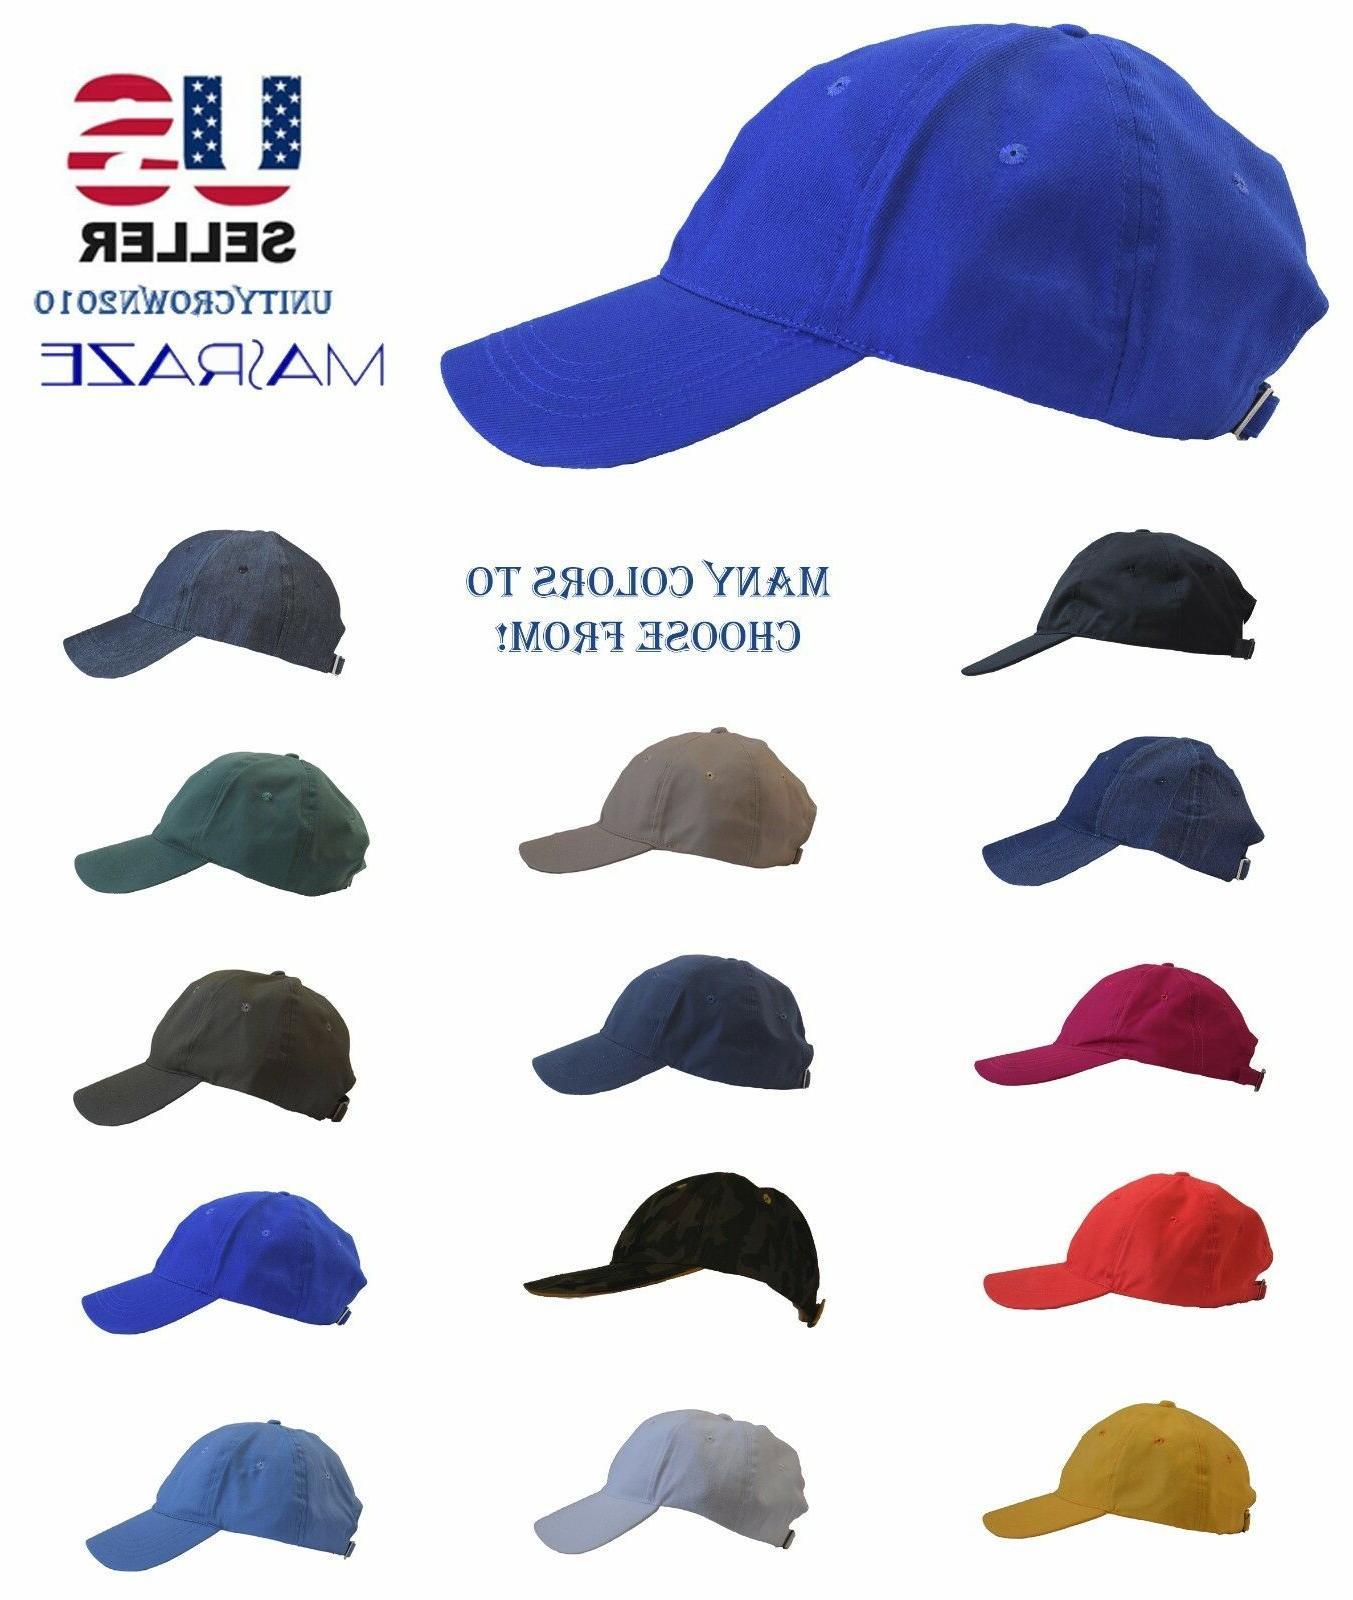 Masraze New Solid Cotton Ball Men/Women Hat Hats